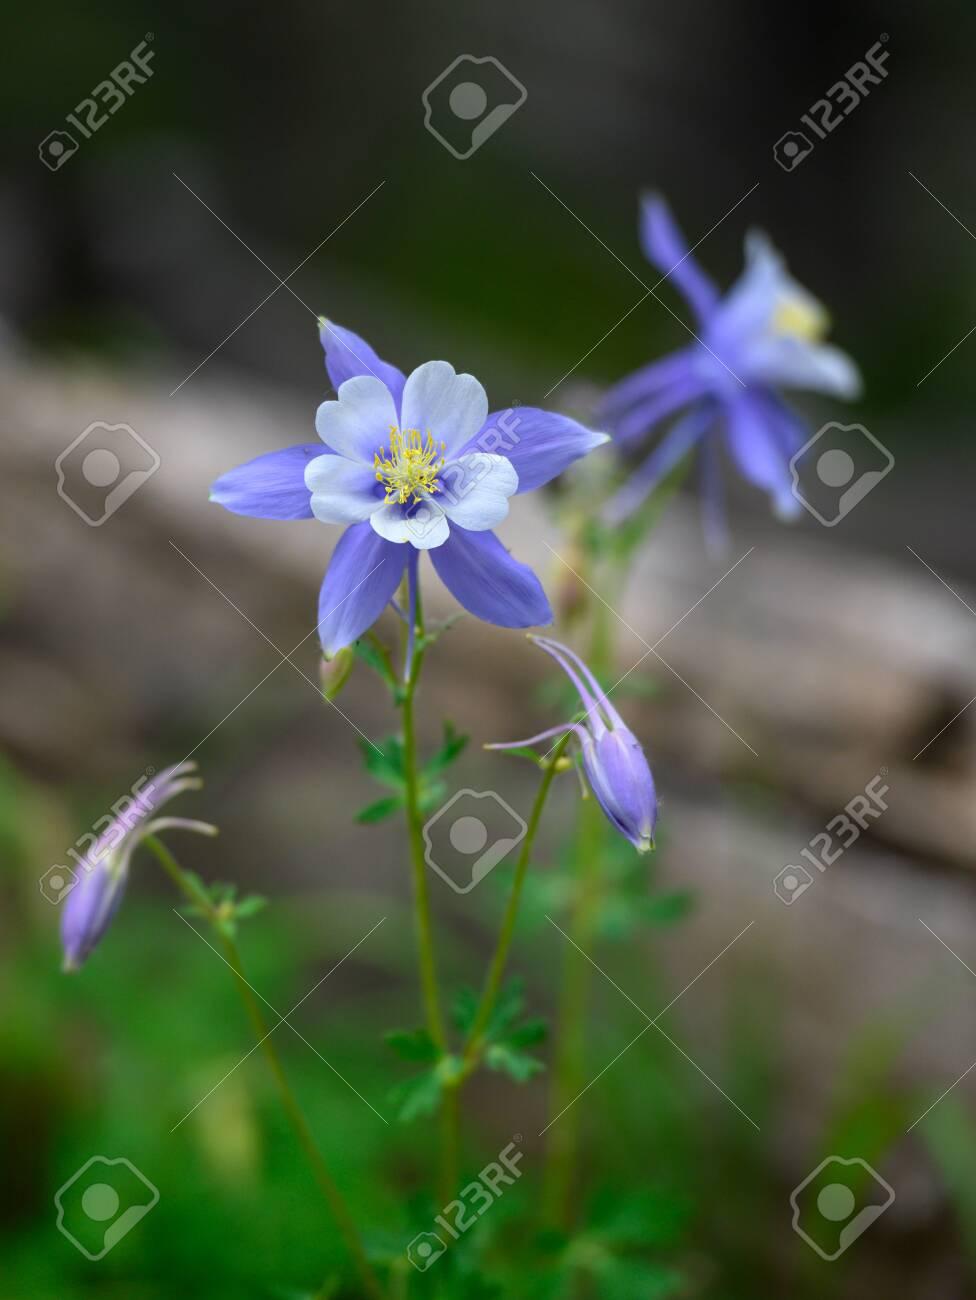 Multiple Columbine Flowers Blooming In Colorado Wilderness Stock